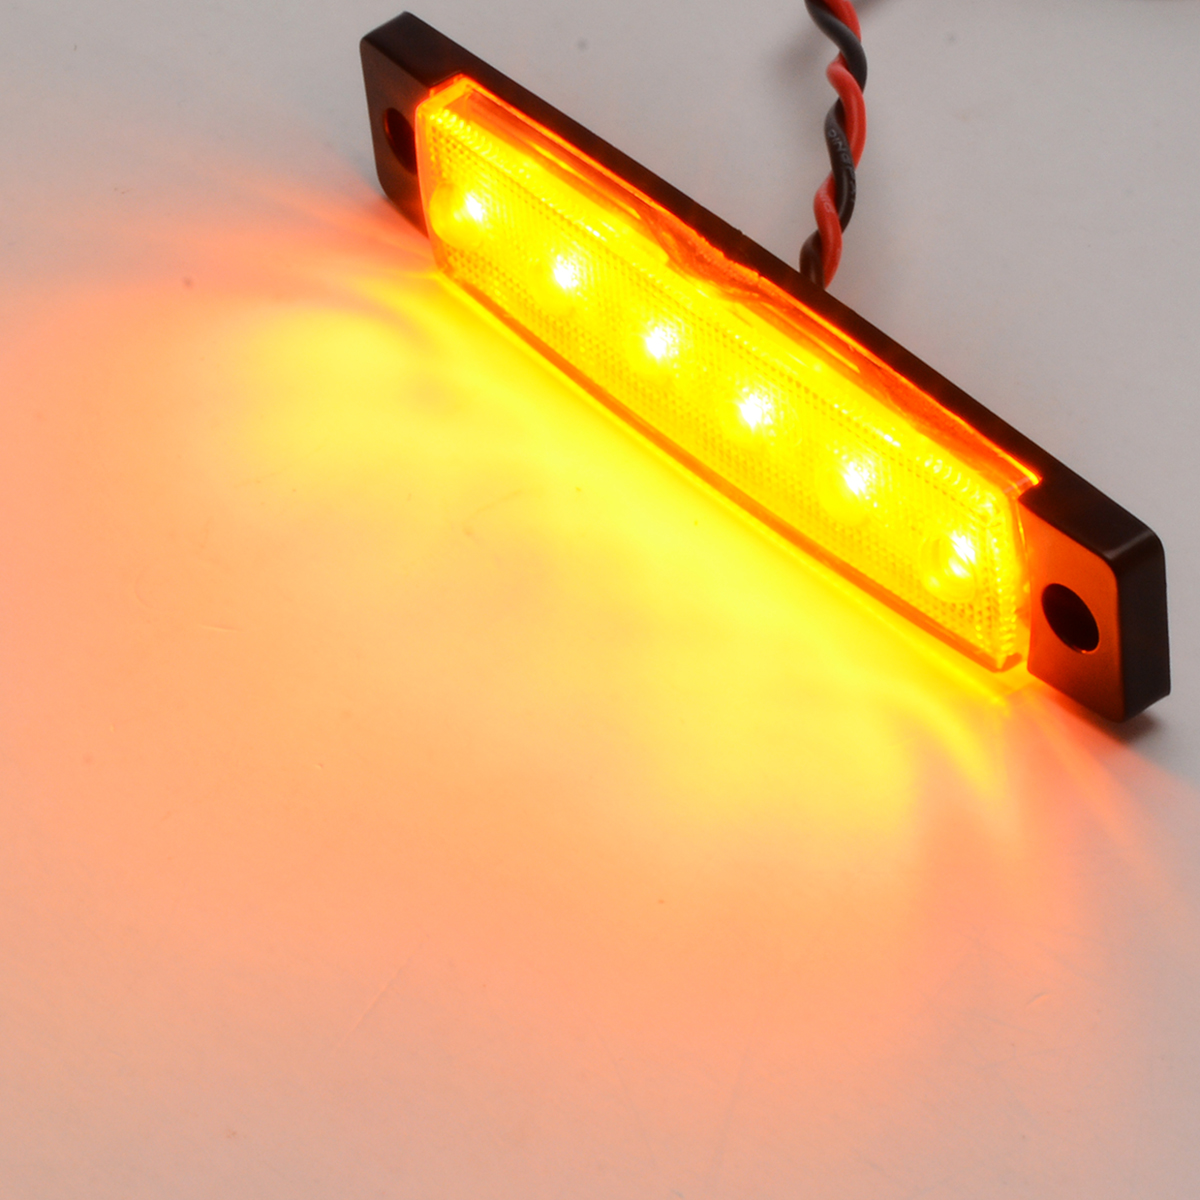 10x Yellow LED 12V 6LED Auto Car Bus Truck Side Marker Indicator Trailer Light Rear Side Lamp Car External Lights